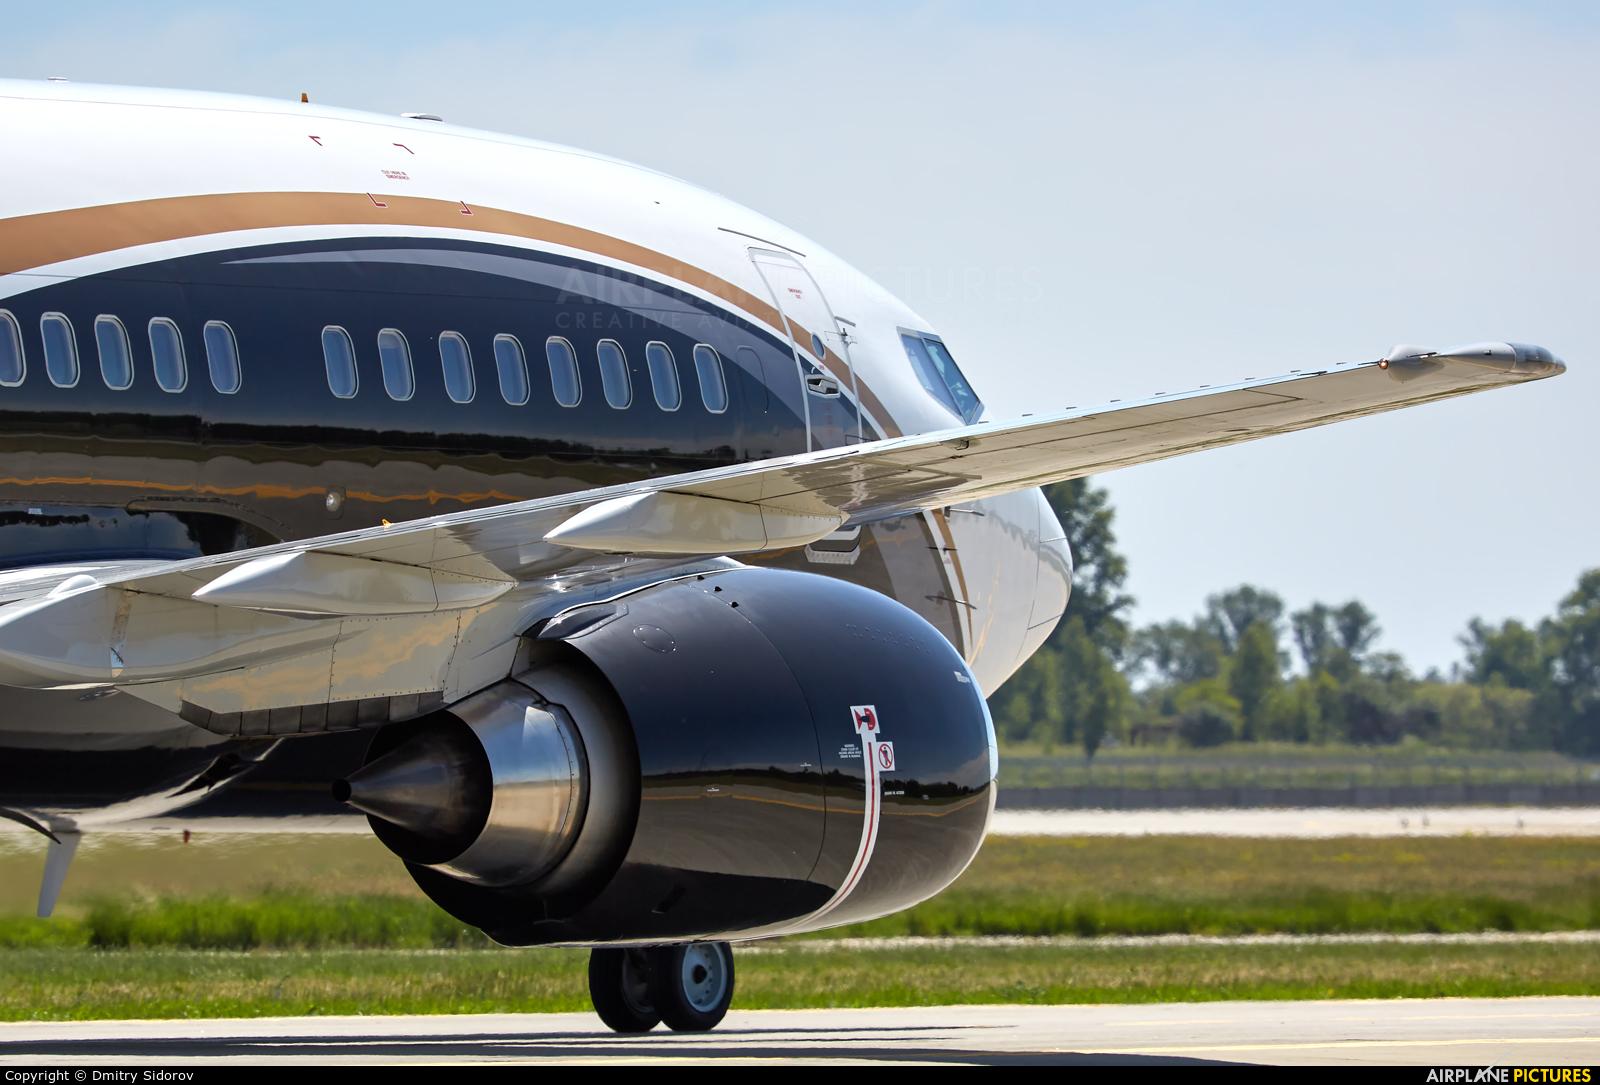 KlasJet LY-KLJ aircraft at Kyiv - Borispol